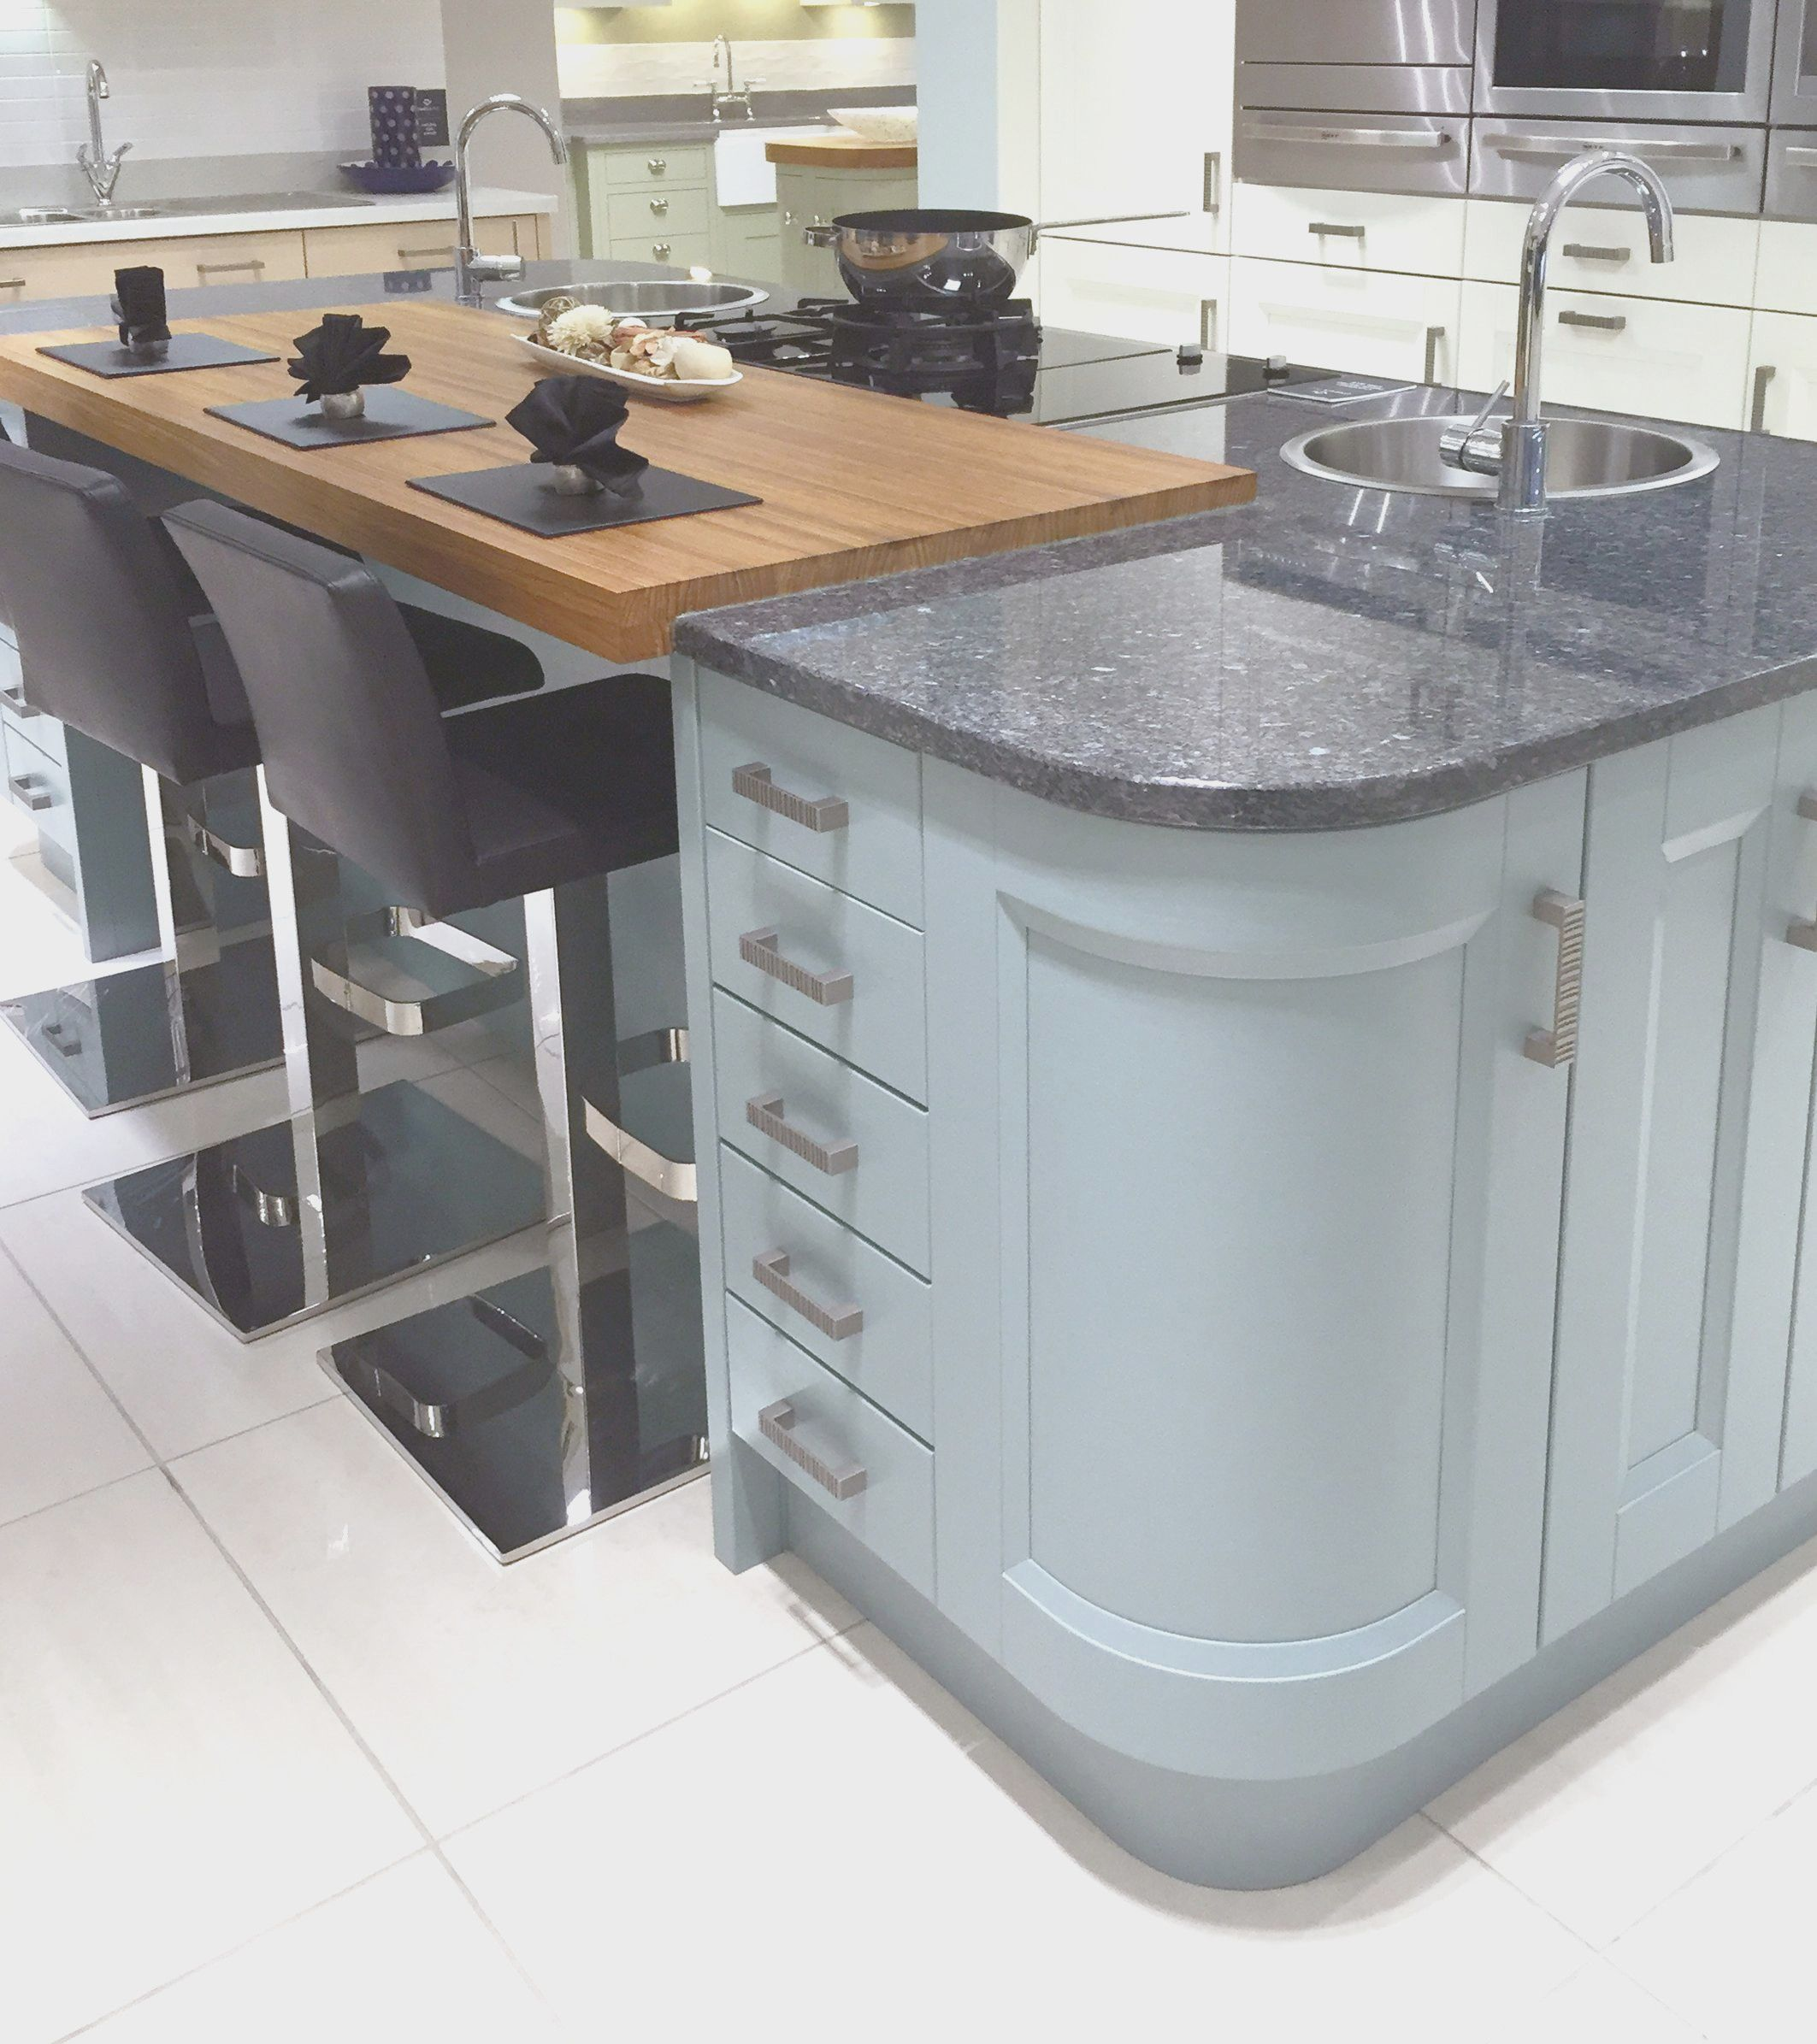 10 Luxury Ideas Uk Kitchen Ideas Contemporary Kitchen Island Granite Kitchen Island Modern Kitchen Island Design